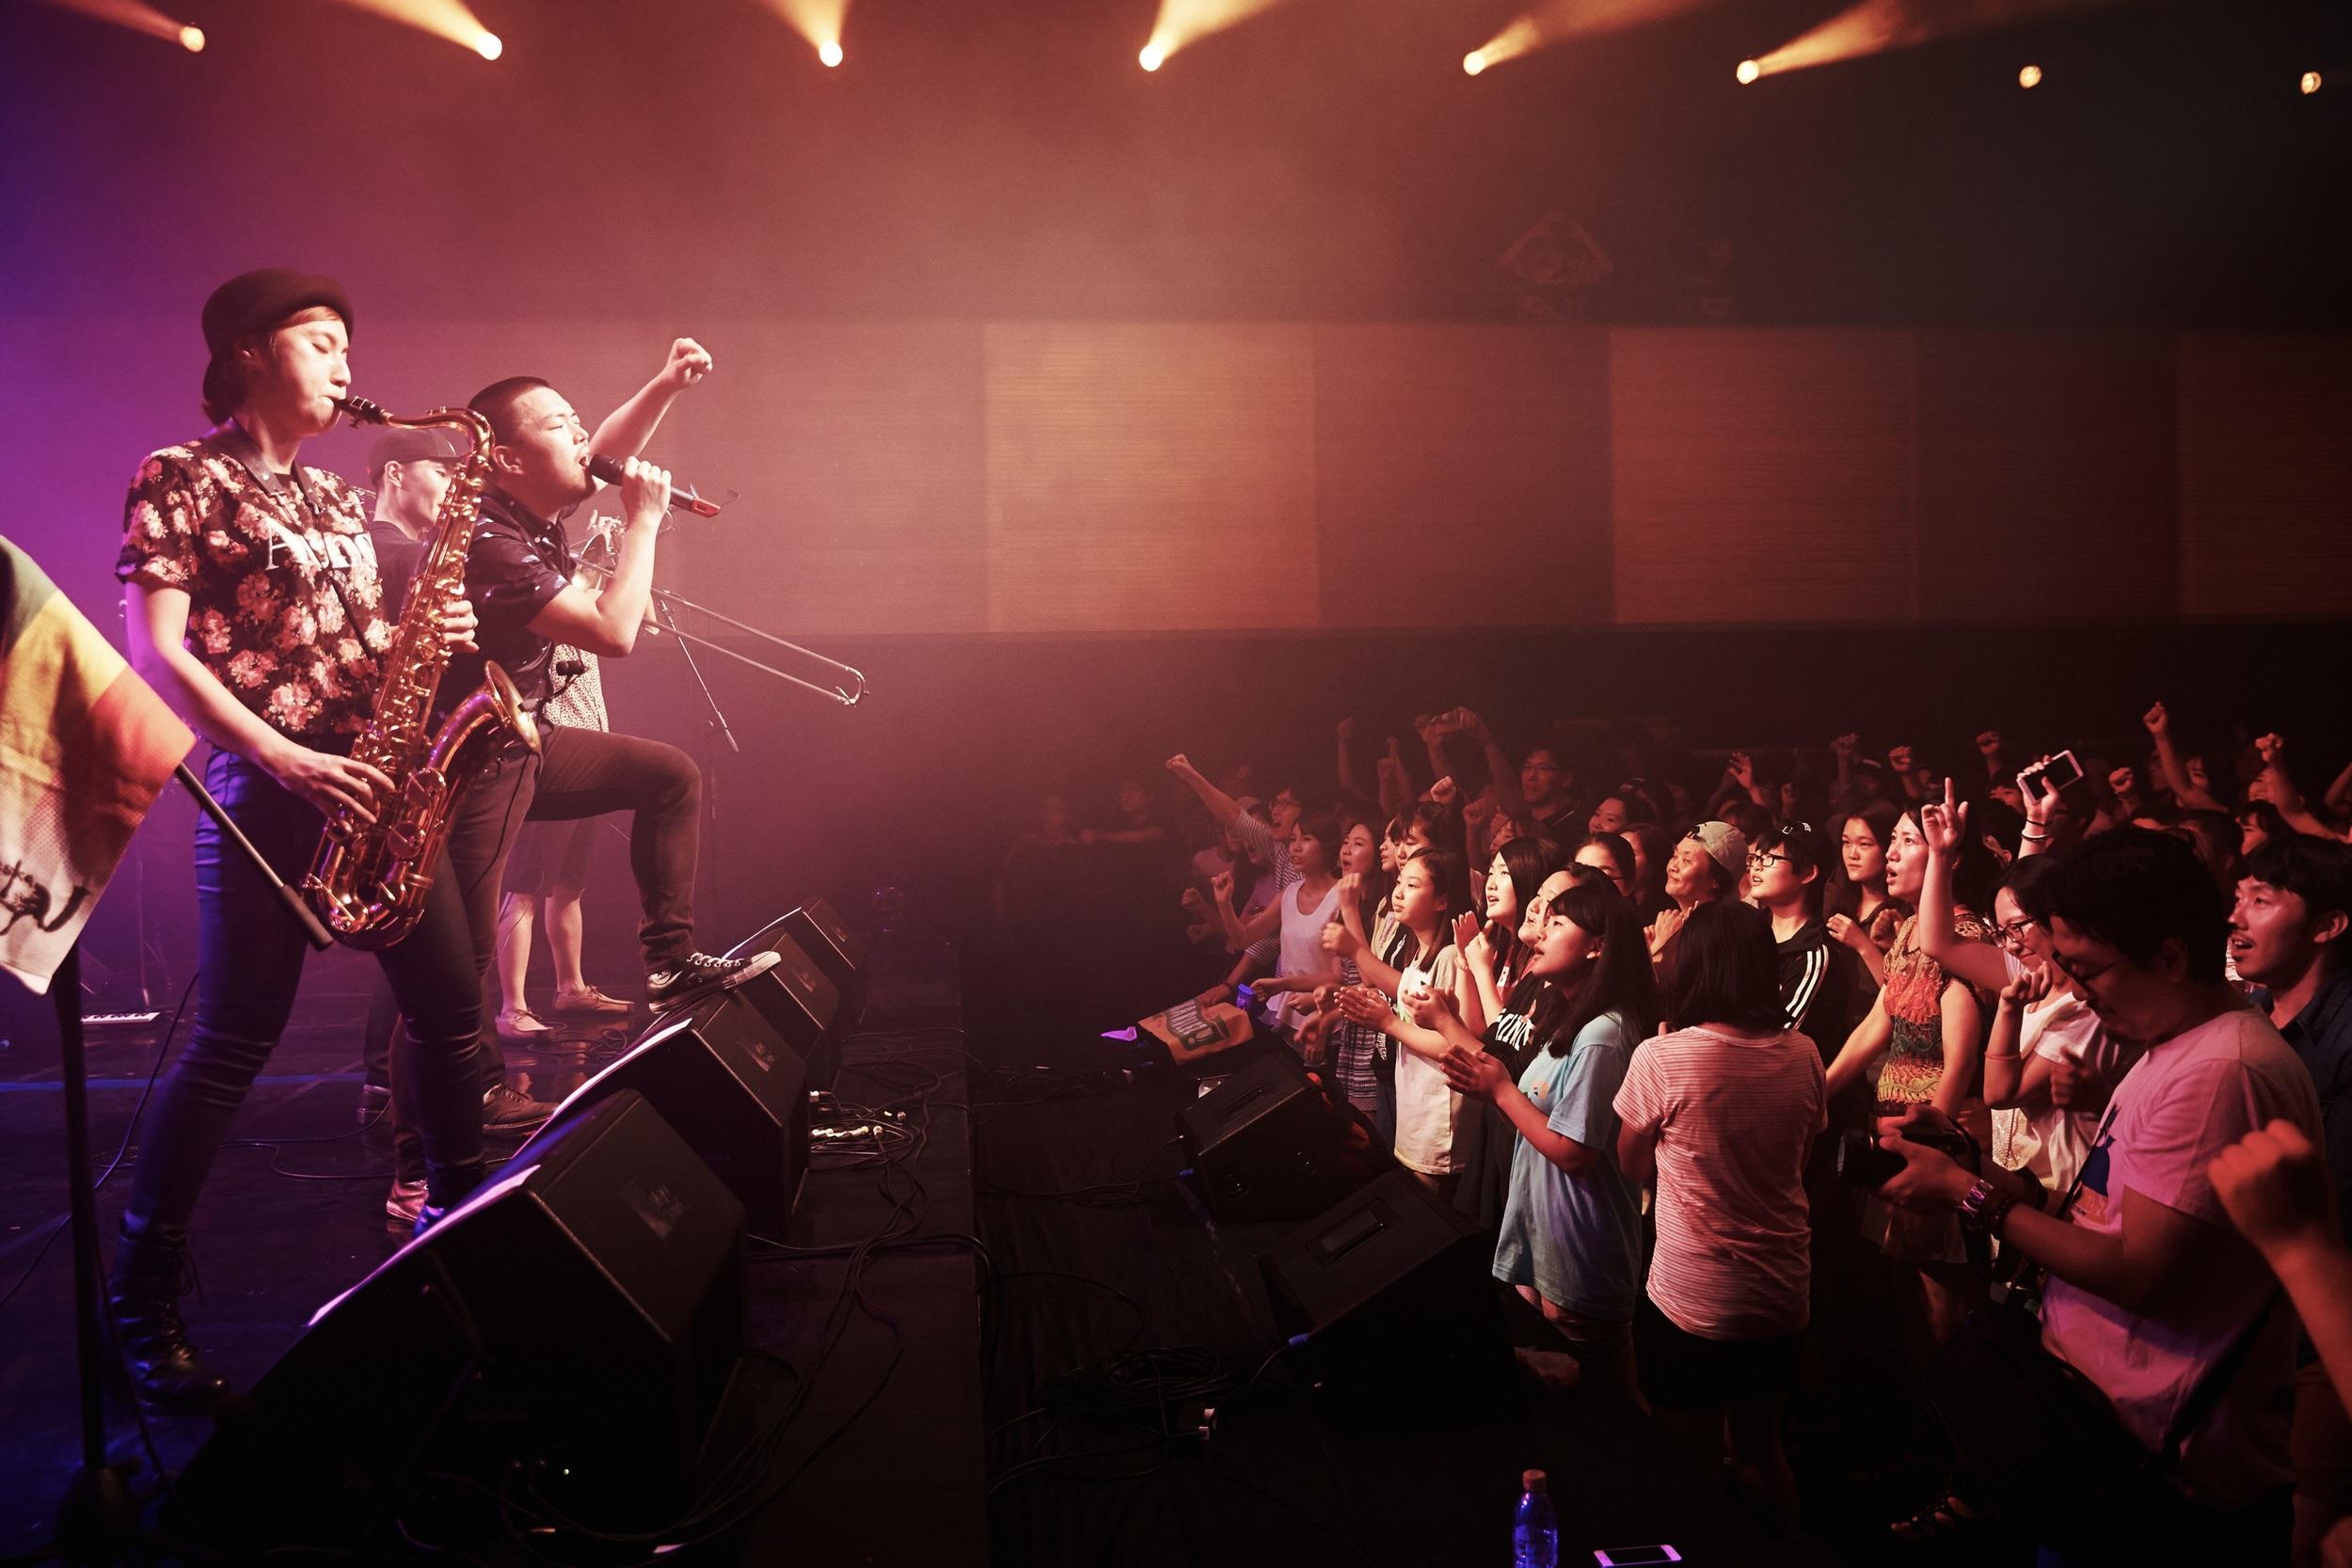 Photo by Joochan Kim